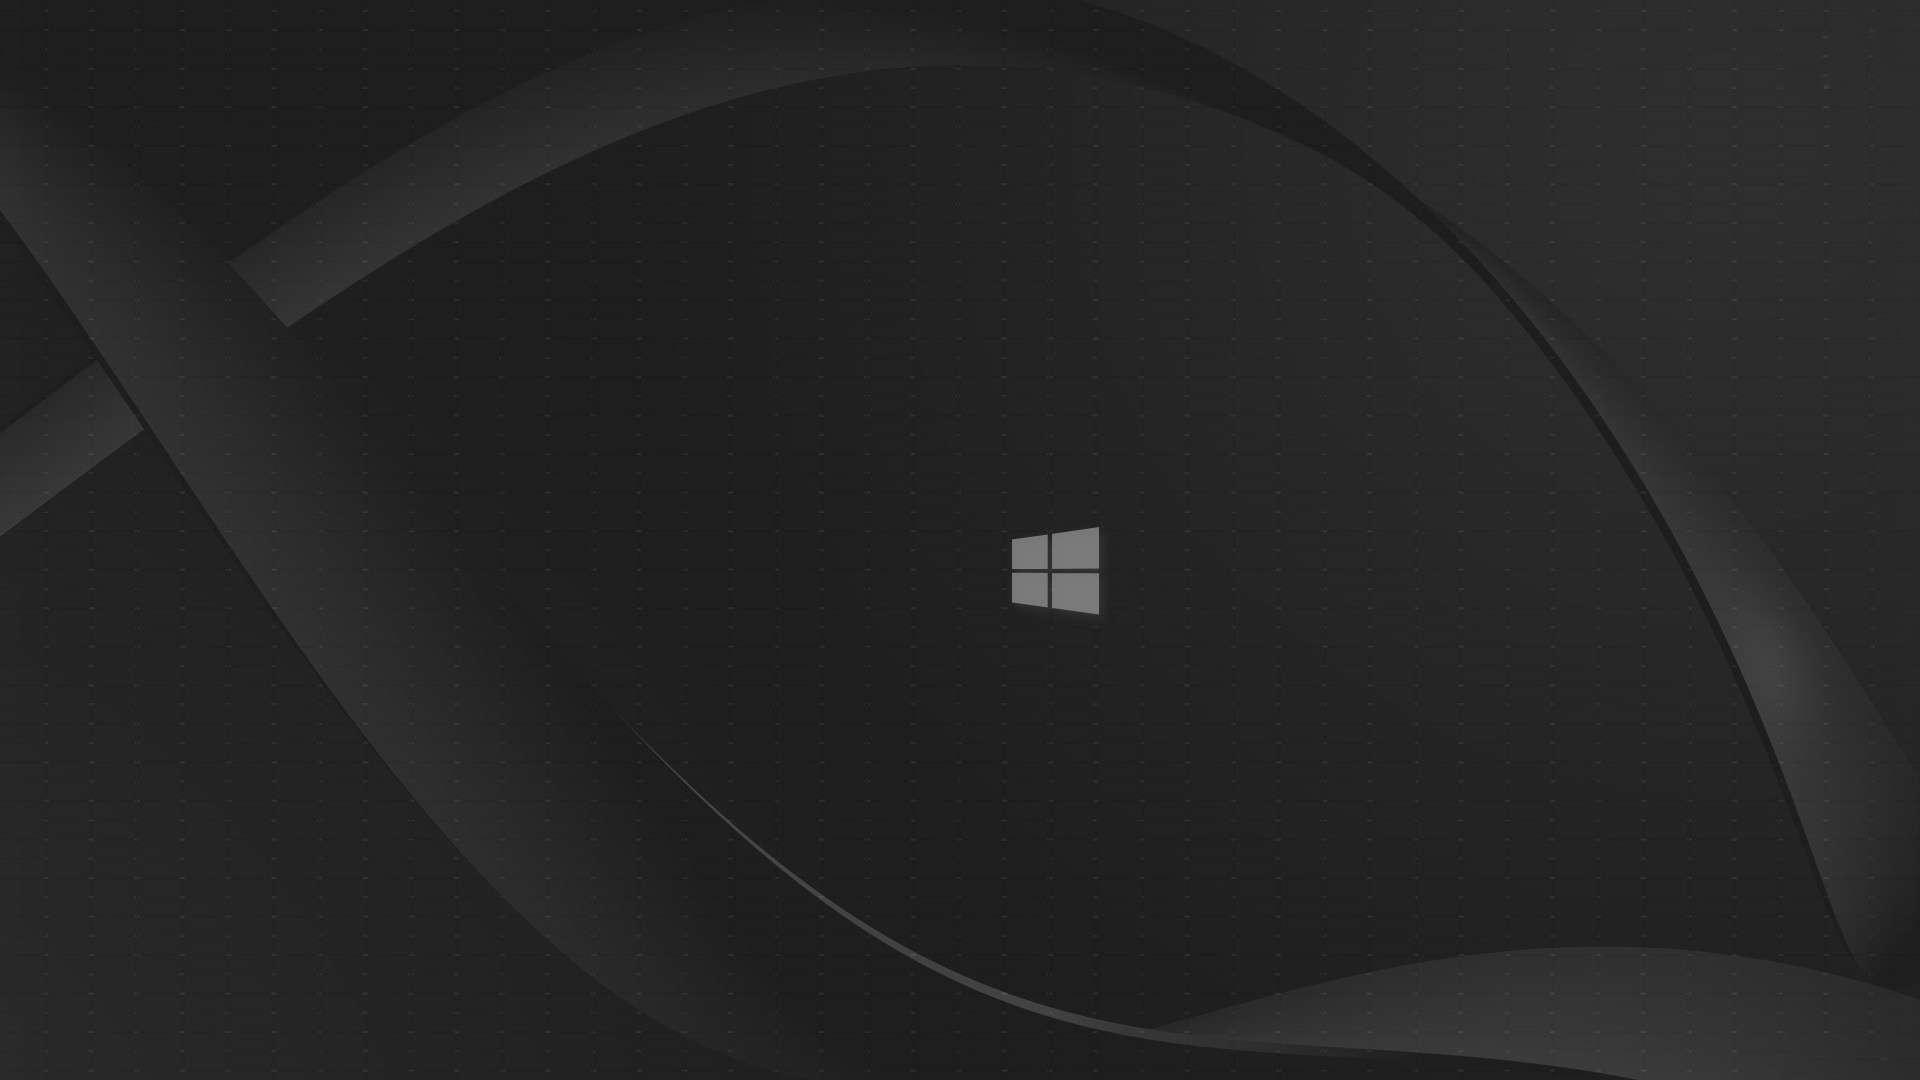 Black Windows Wallpaper 1080p: Windows 10 Wallpaper HD 1080p